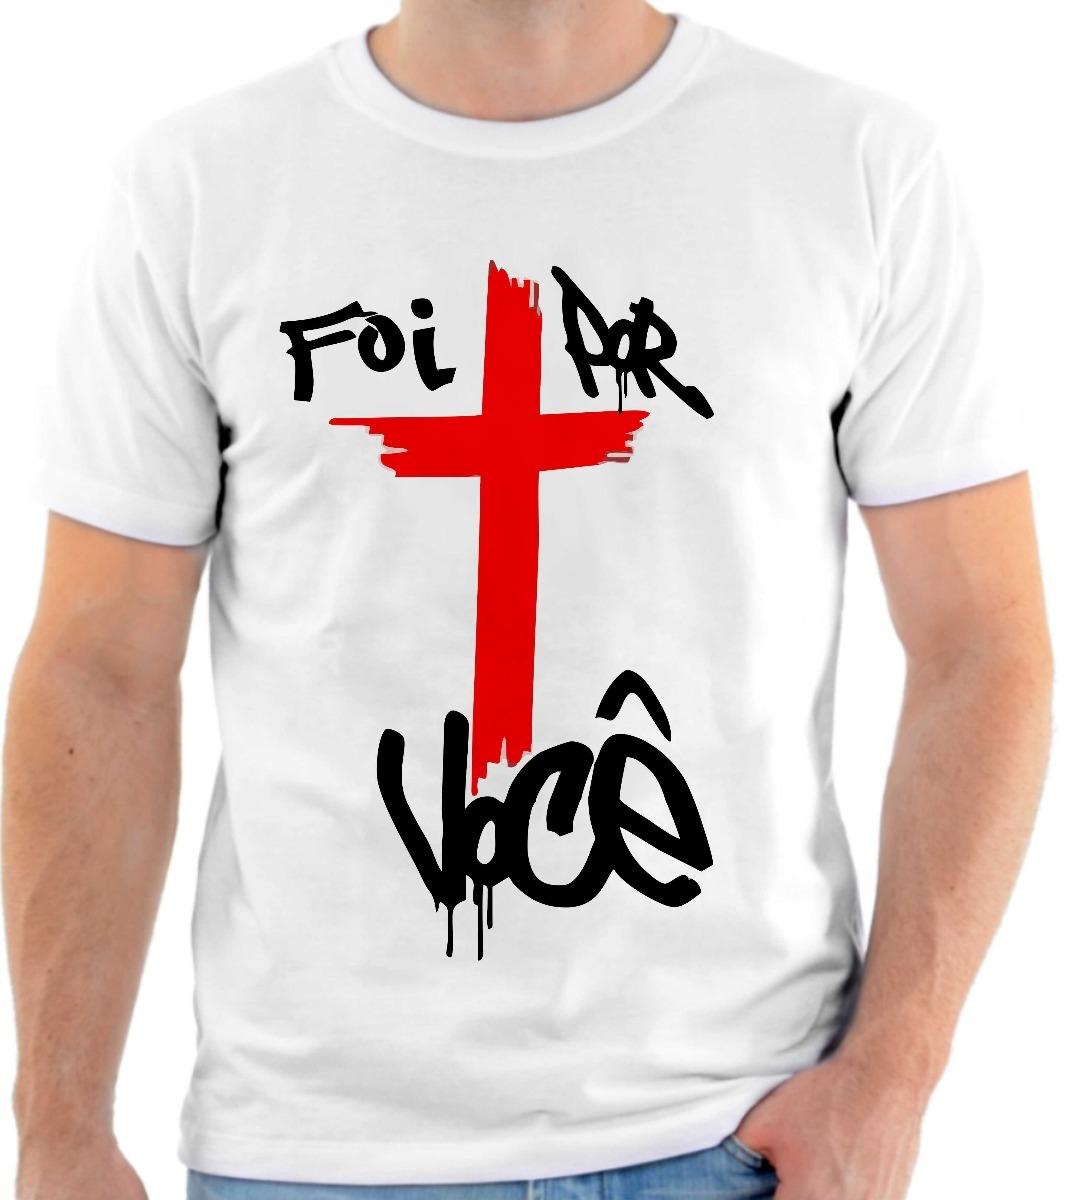 798586c2e camiseta camisa personalizada jesus salvador deus full hd 06. Carregando  zoom.